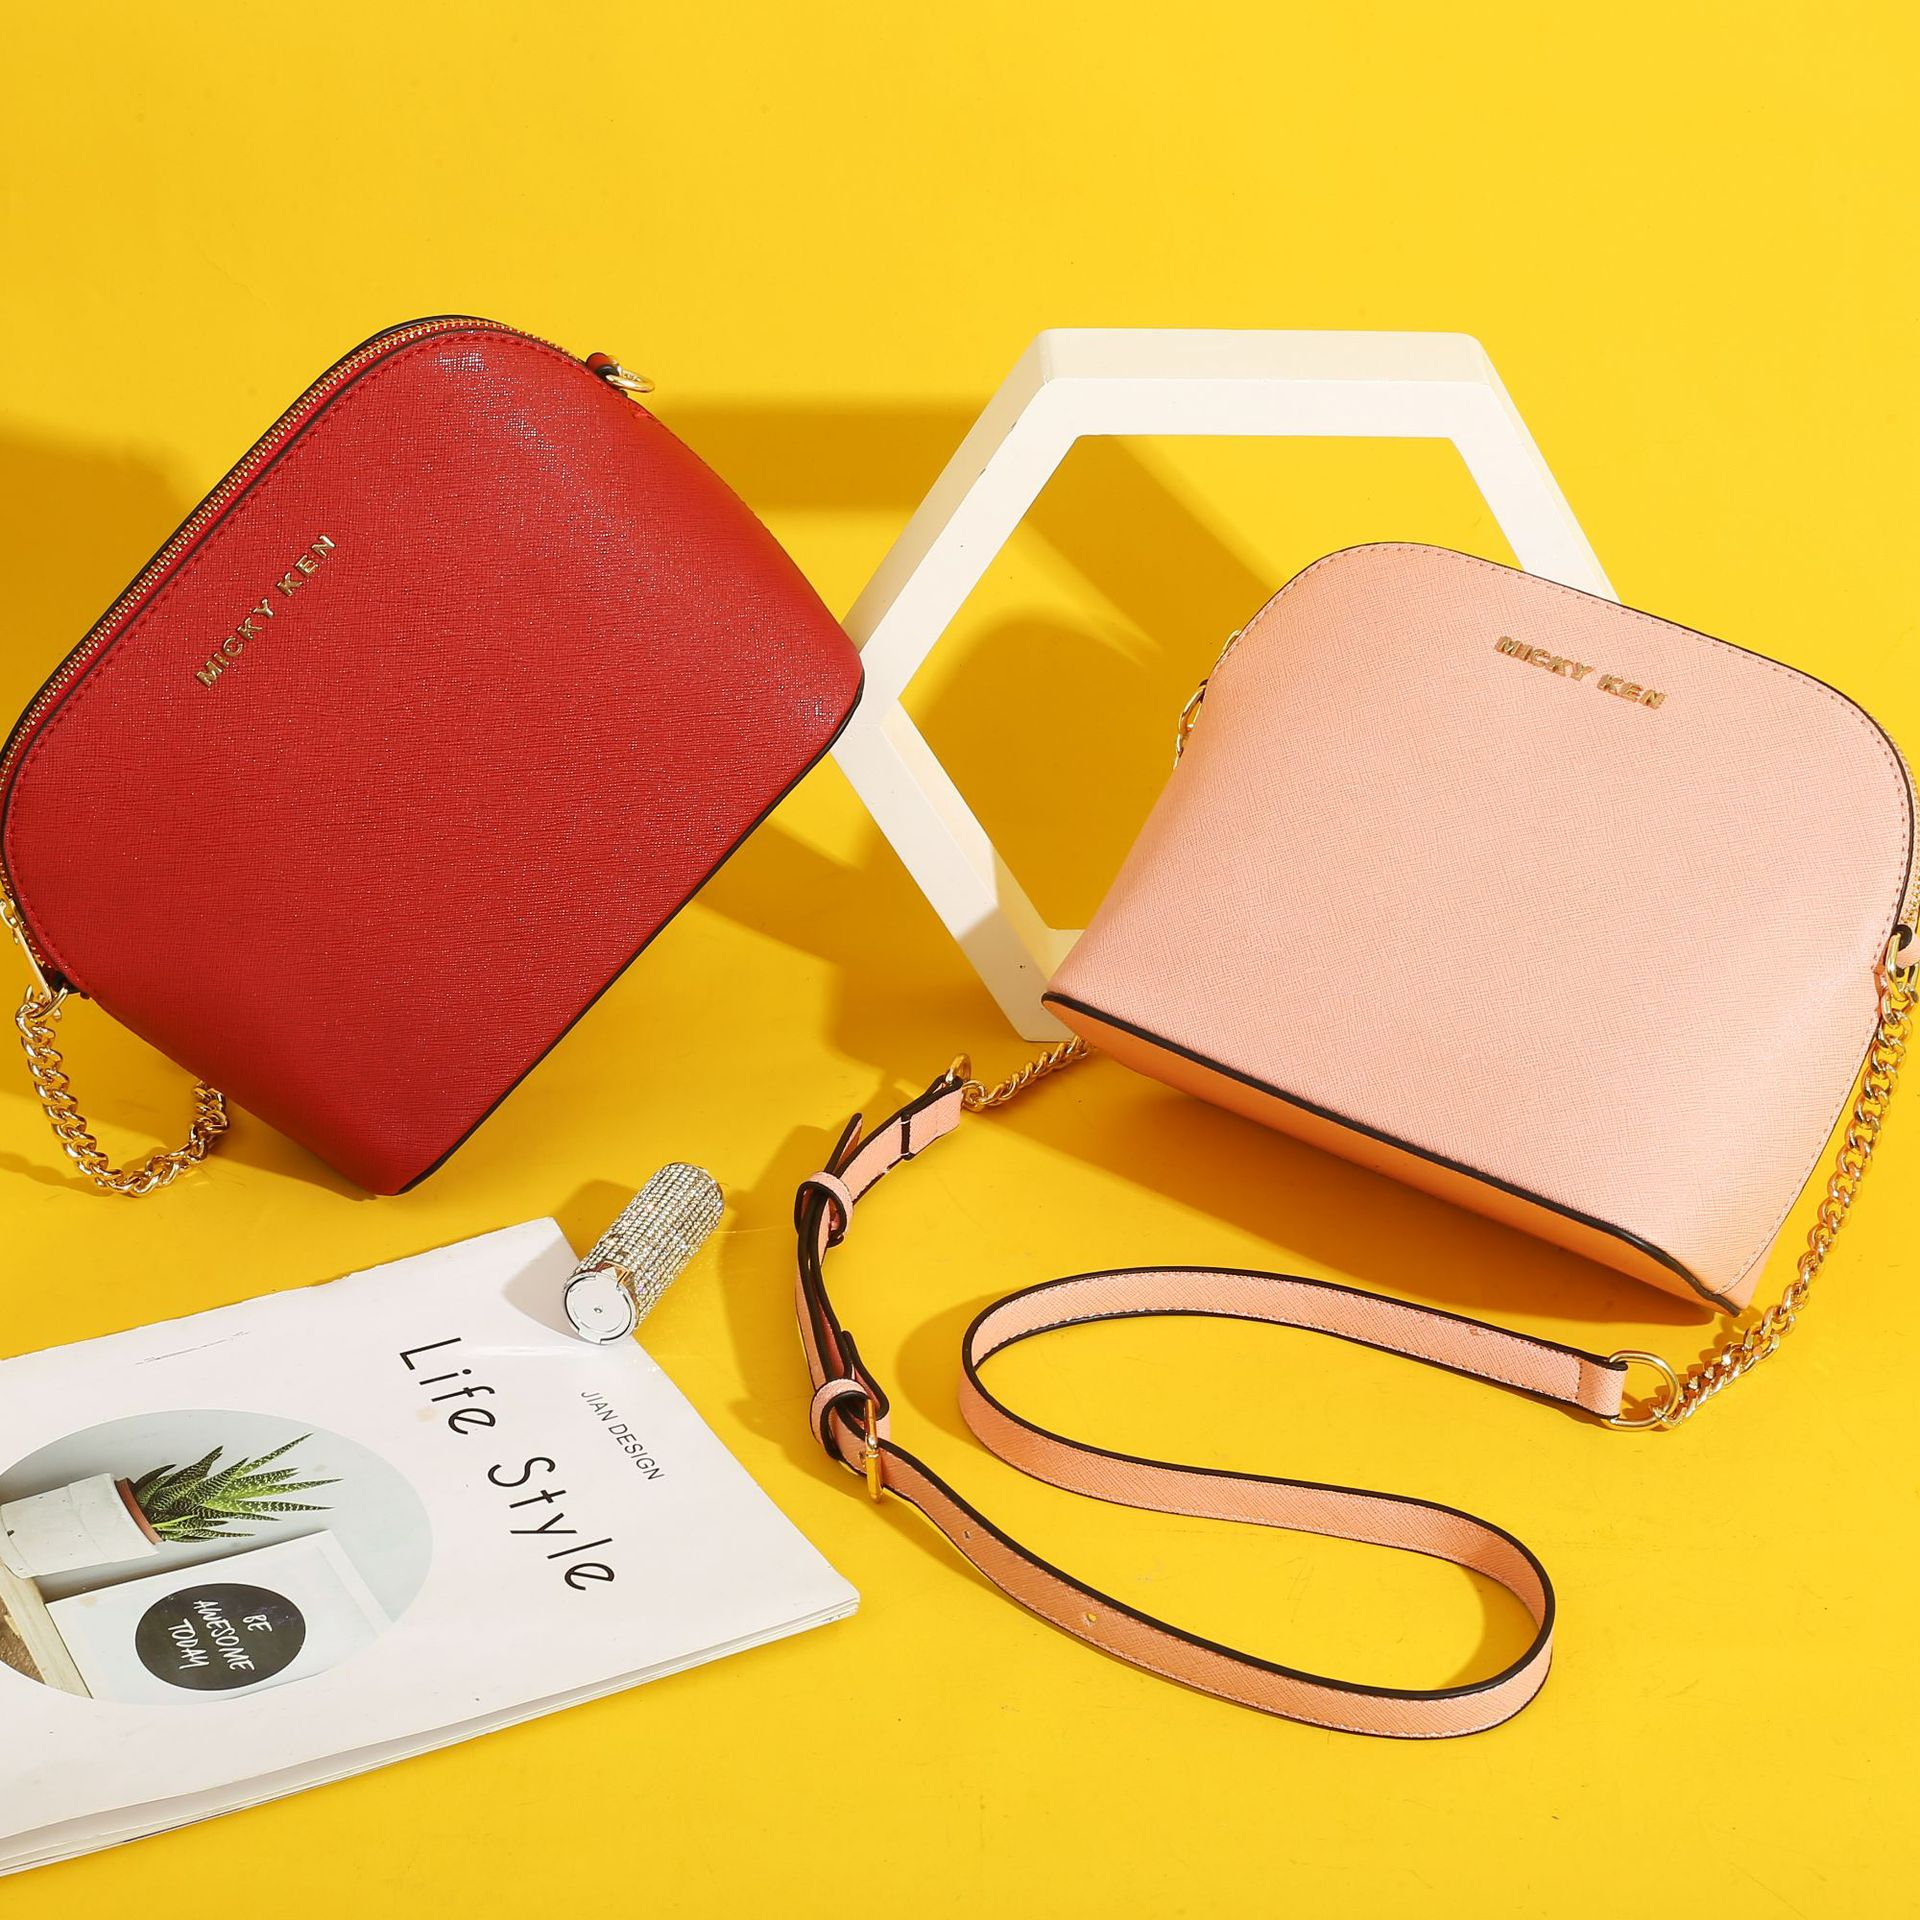 Metal Letter Women Small Square Bag Ladies Car Line Fashion Handbag Retro Shoulder Bags Messenger Shell Bag Mobile Phone Packet